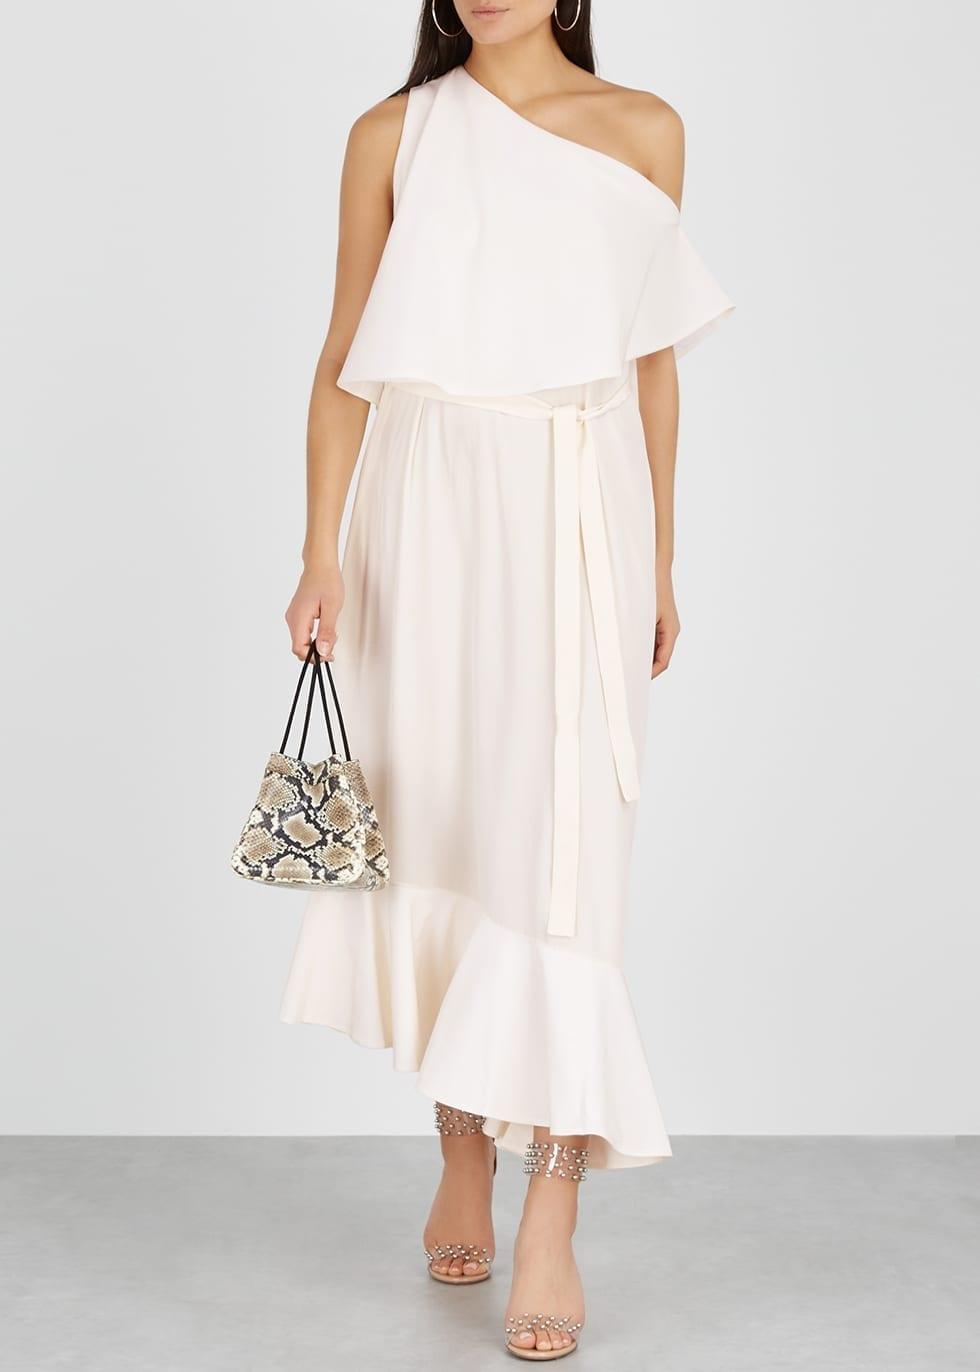 72635d67ddd4 STELLA MCCARTNEY One-shoulder Silk Crepe De Chine Cream Dress - We ...